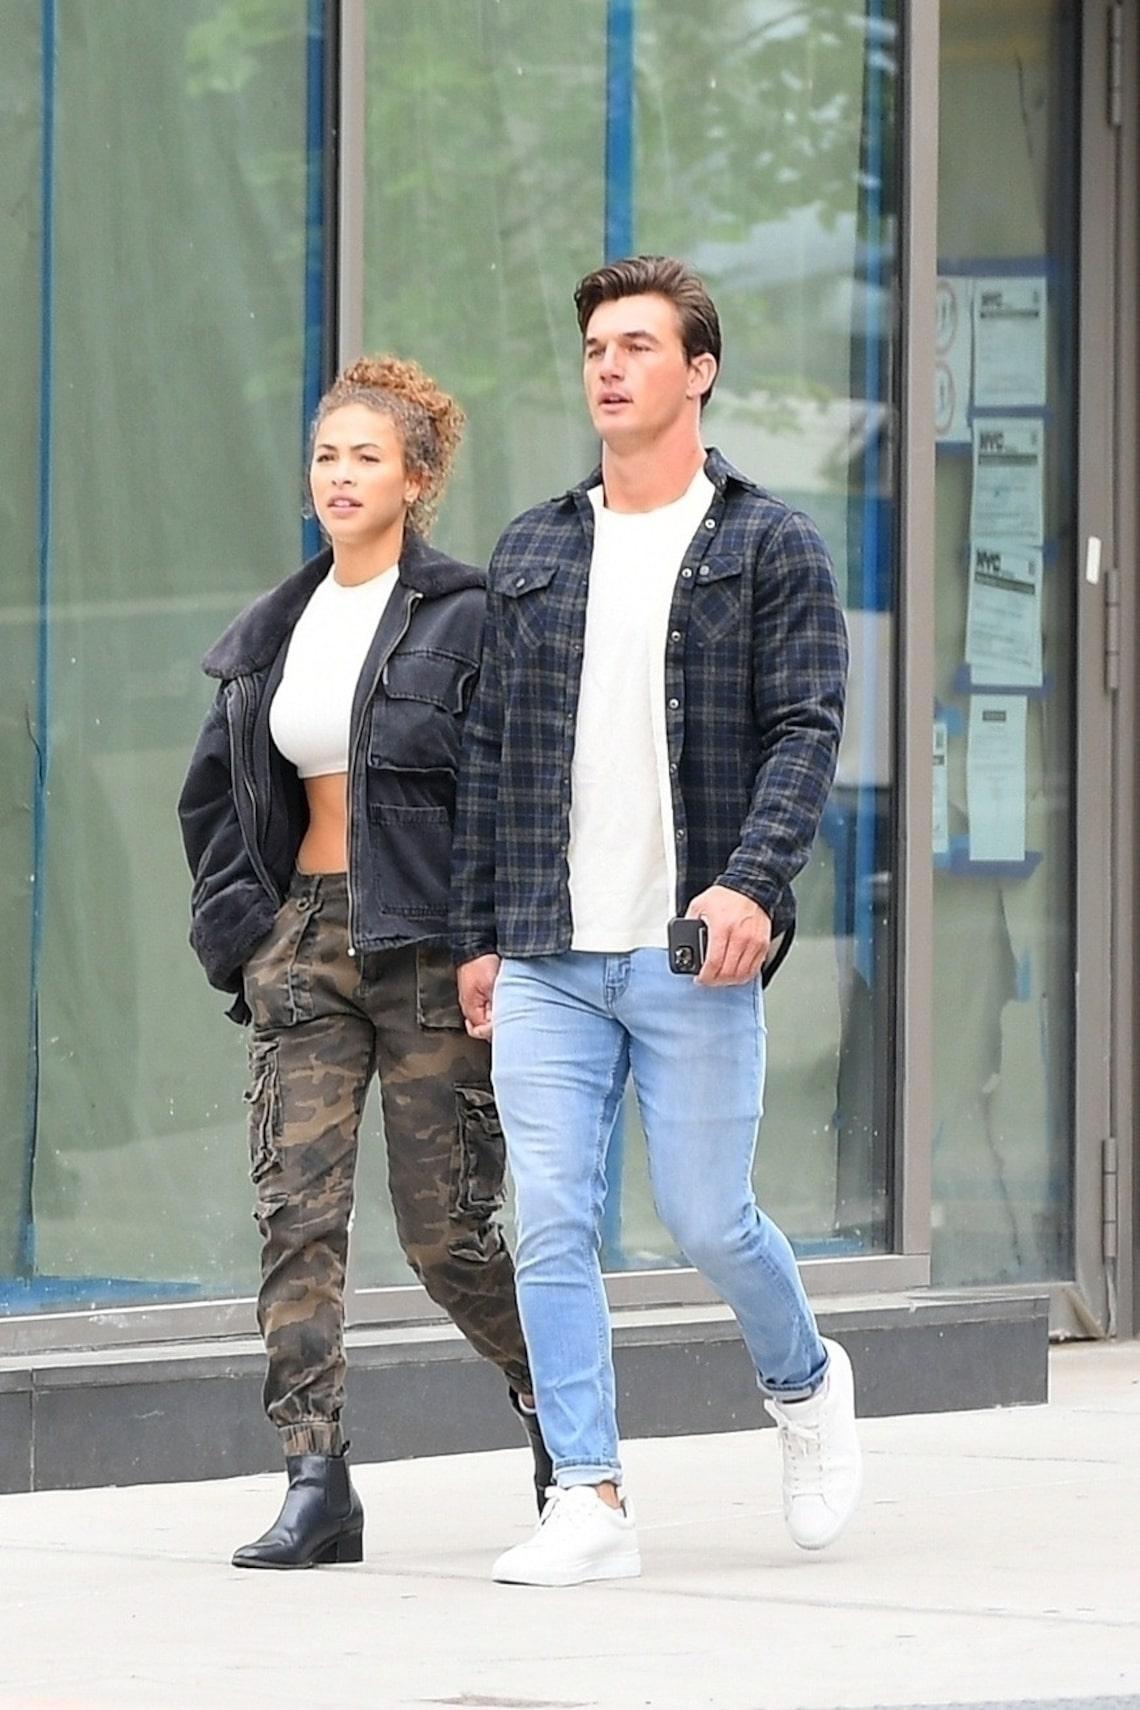 camila și johnny dating 2021